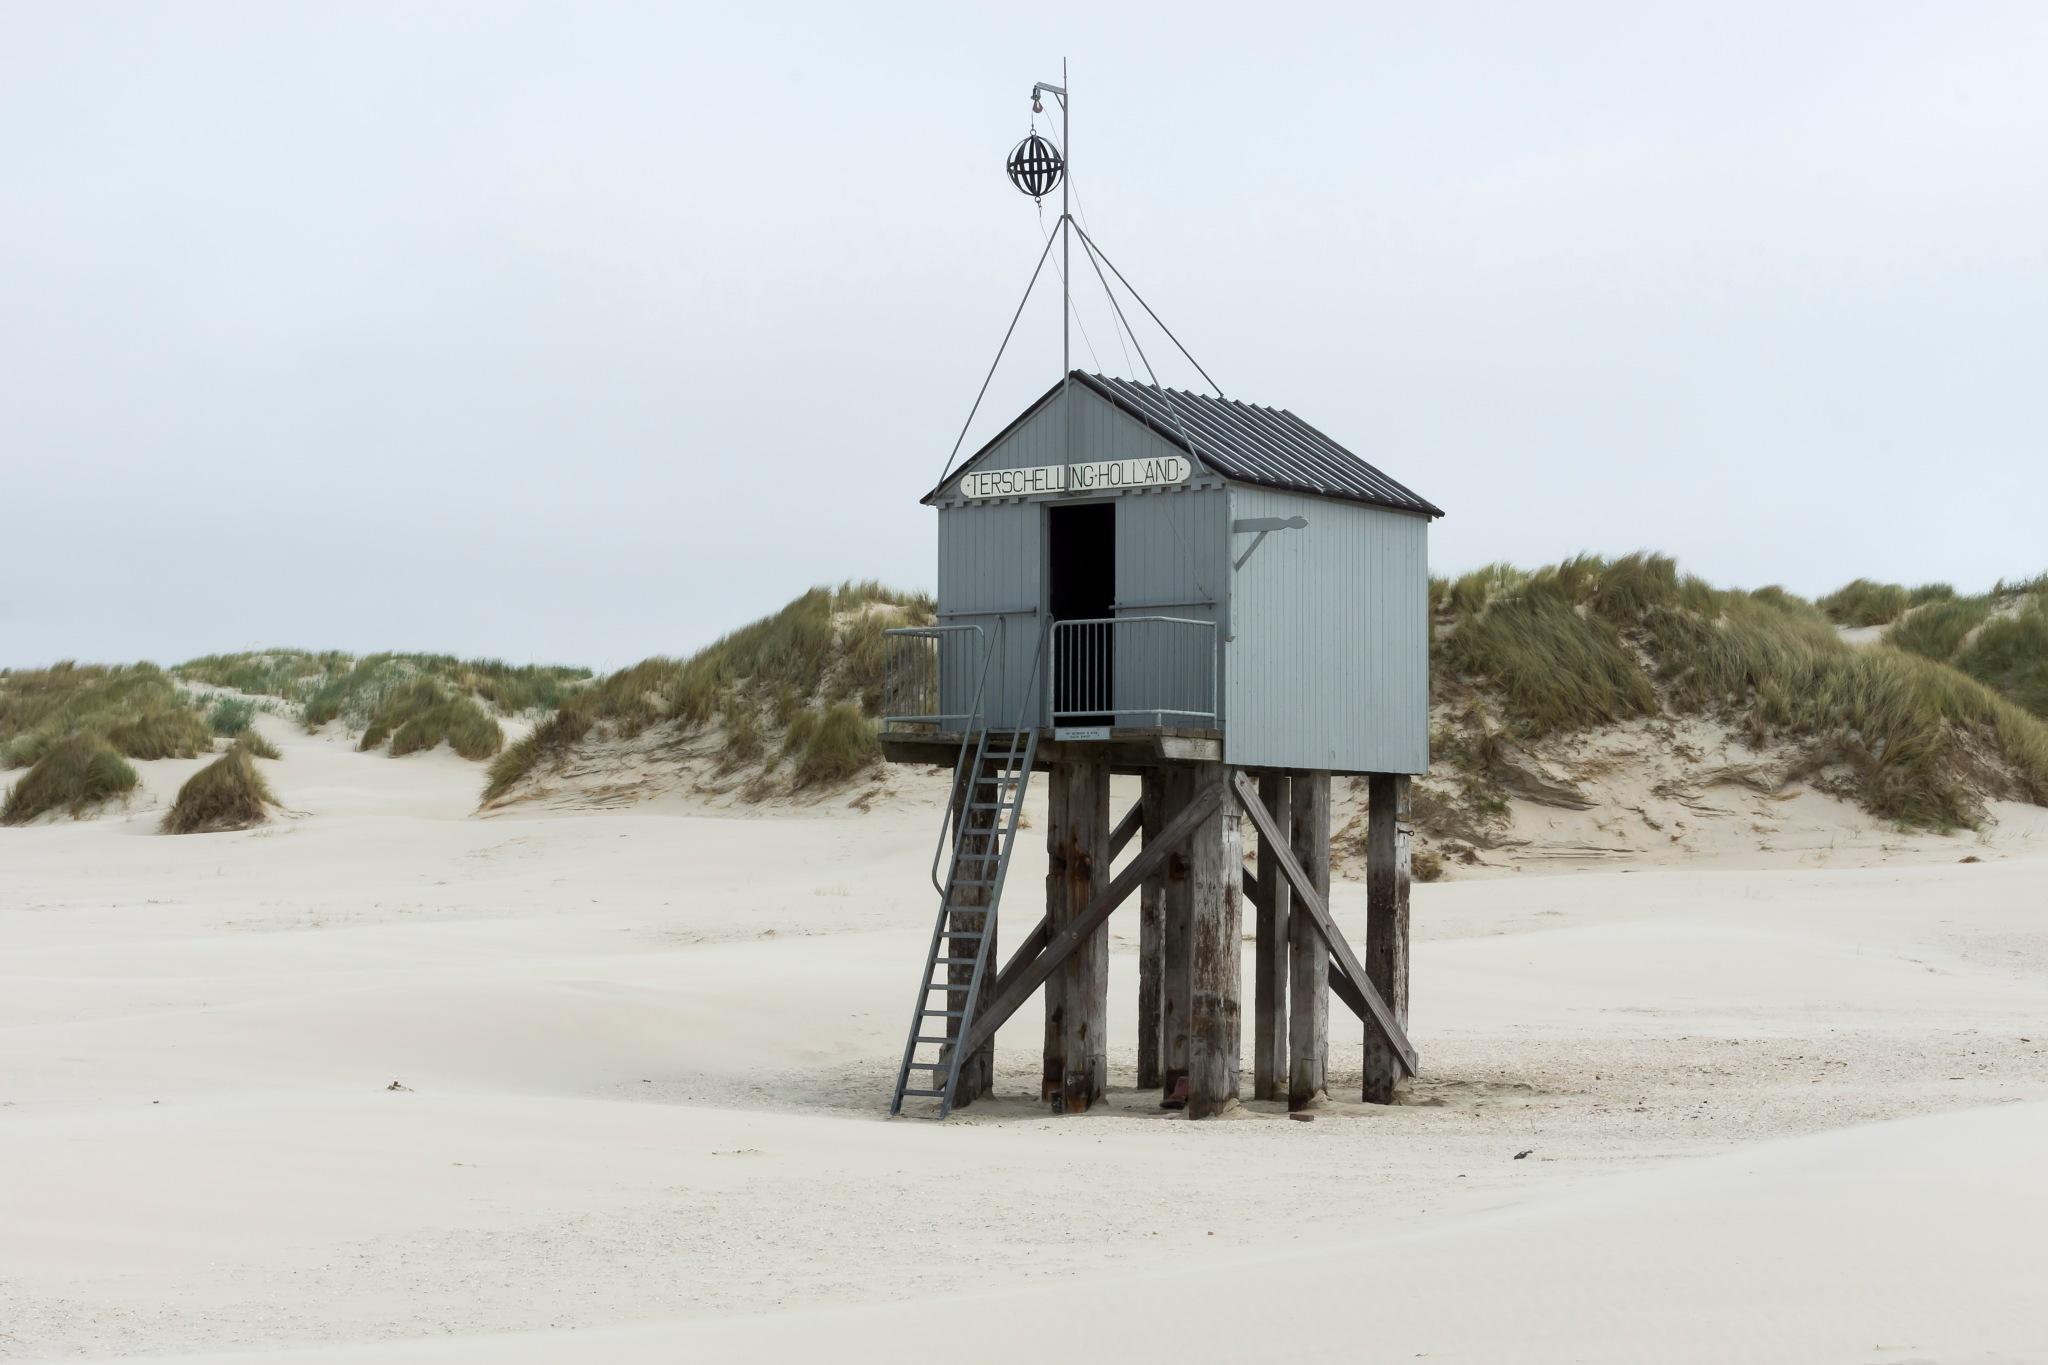 Last Shelter II by Rob van der Griend